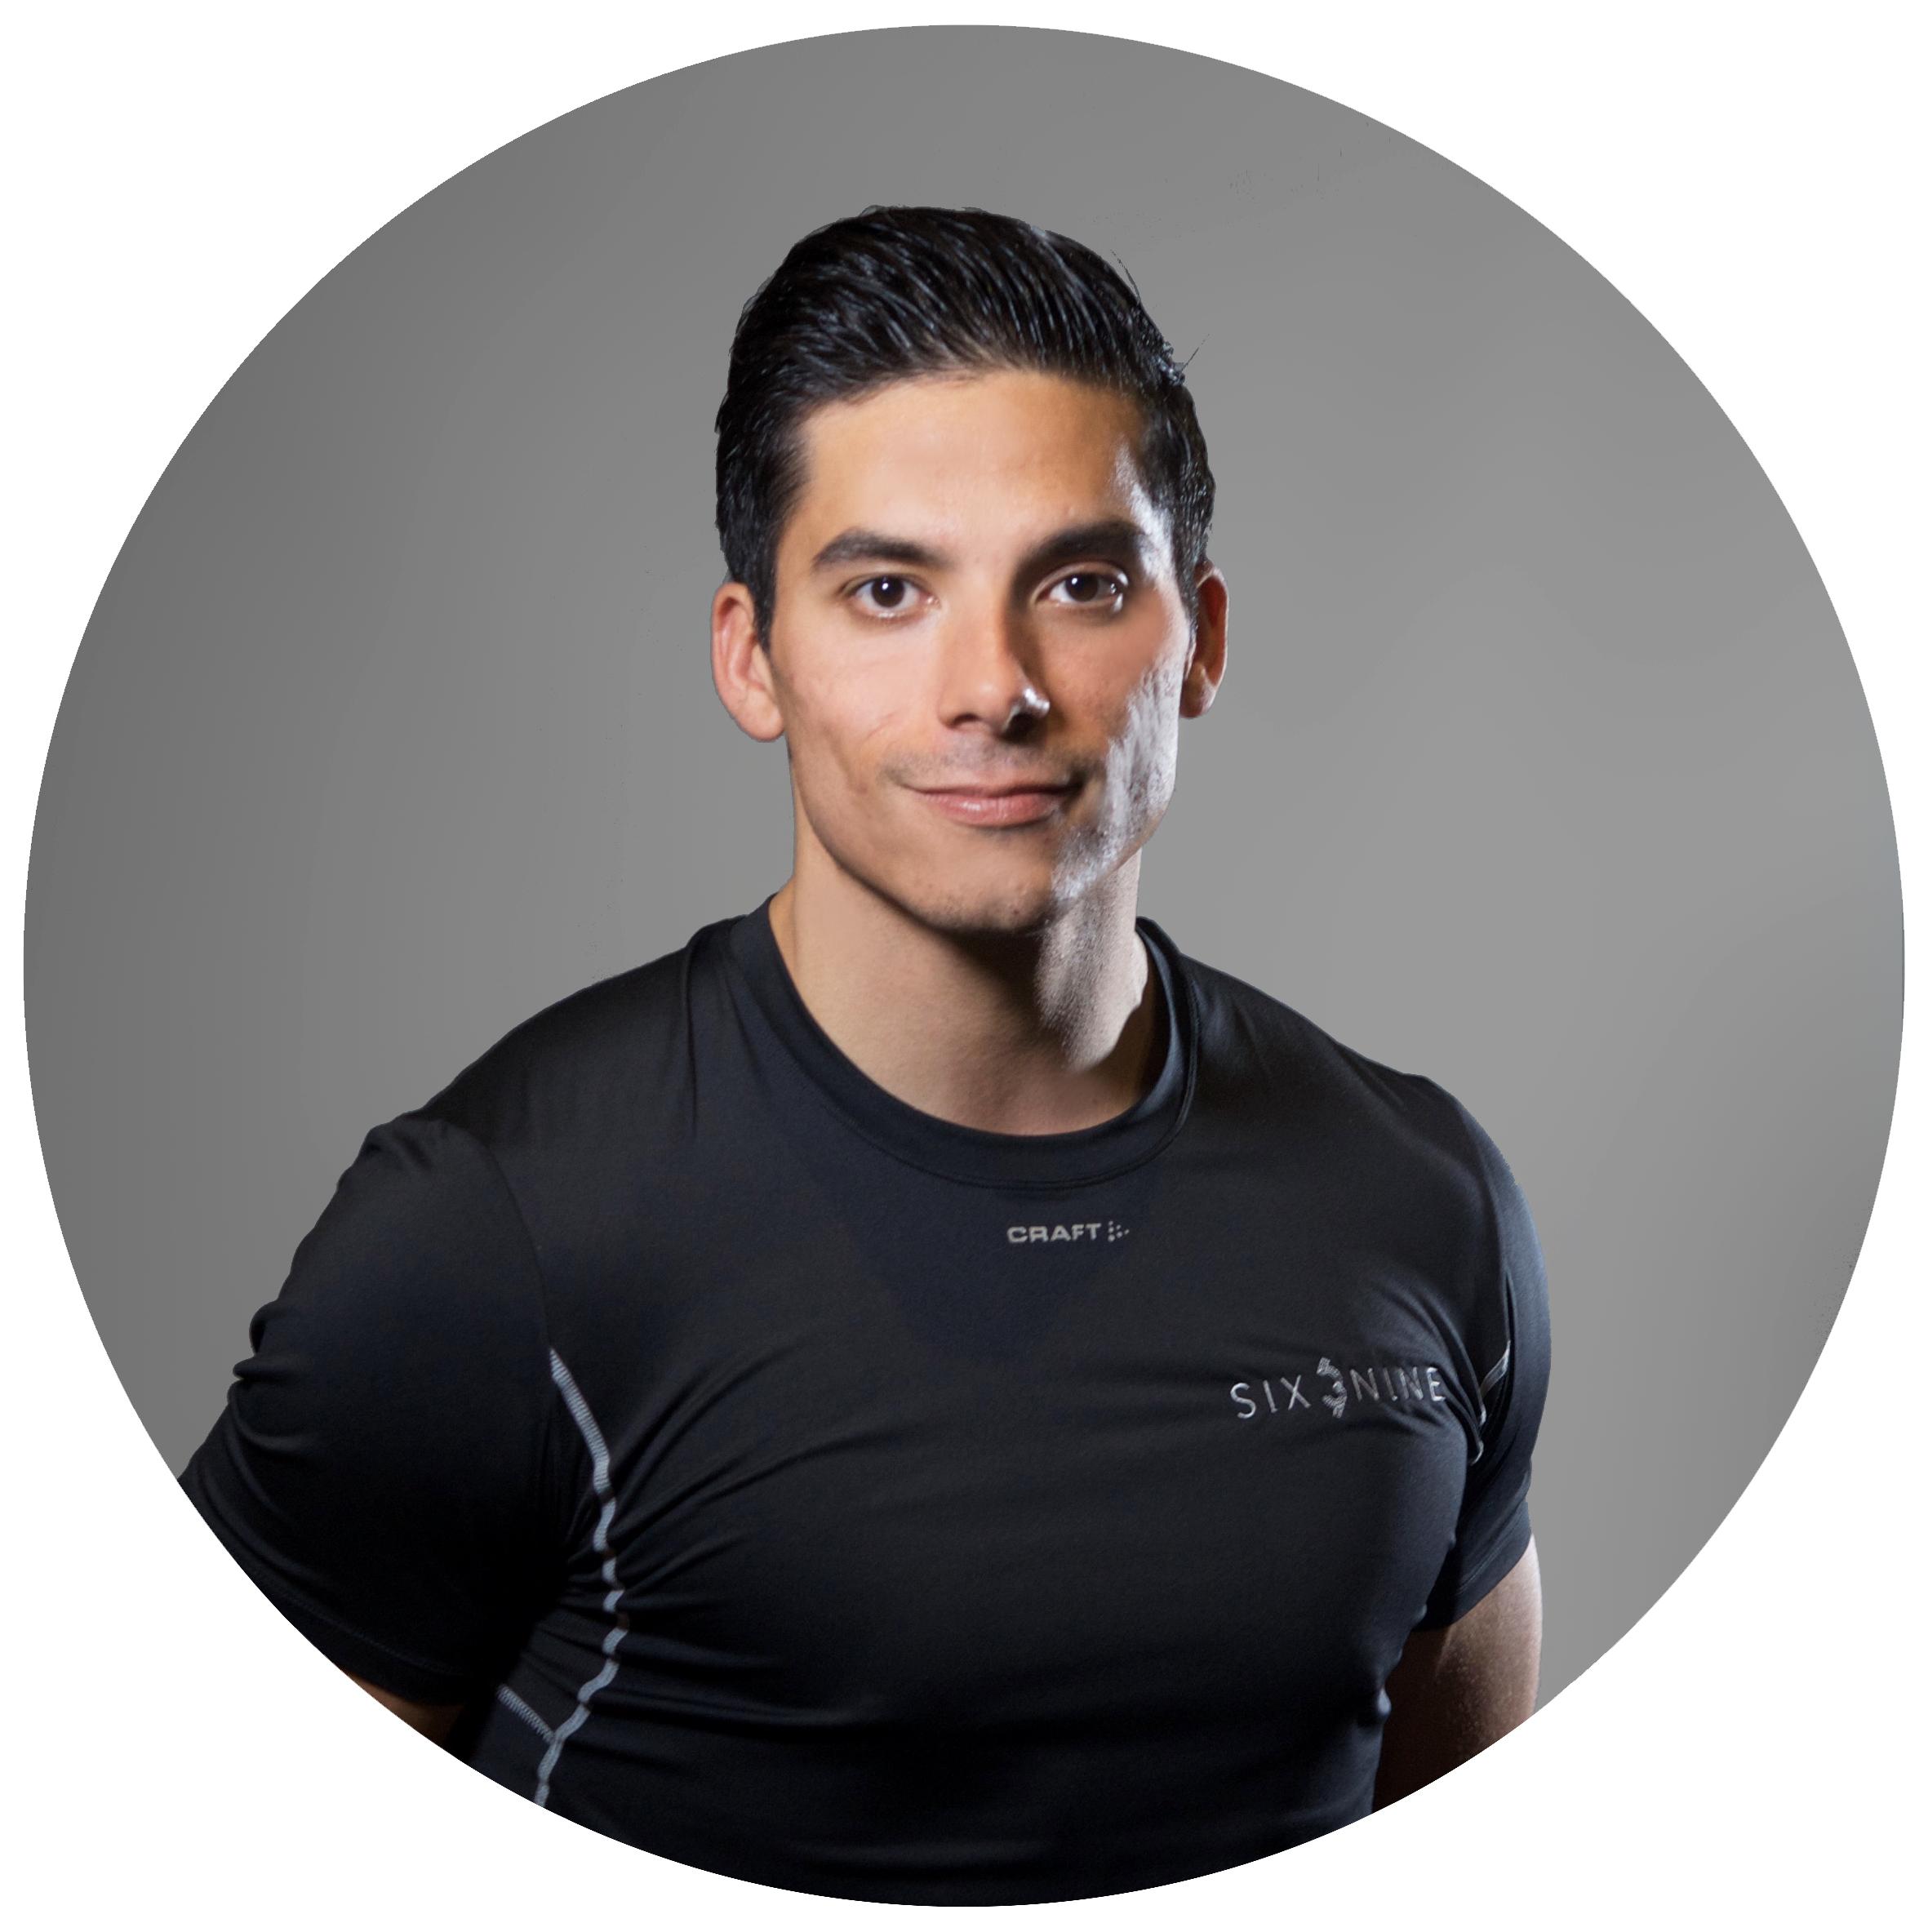 Joshua Peters, SIX3NINE Trainer